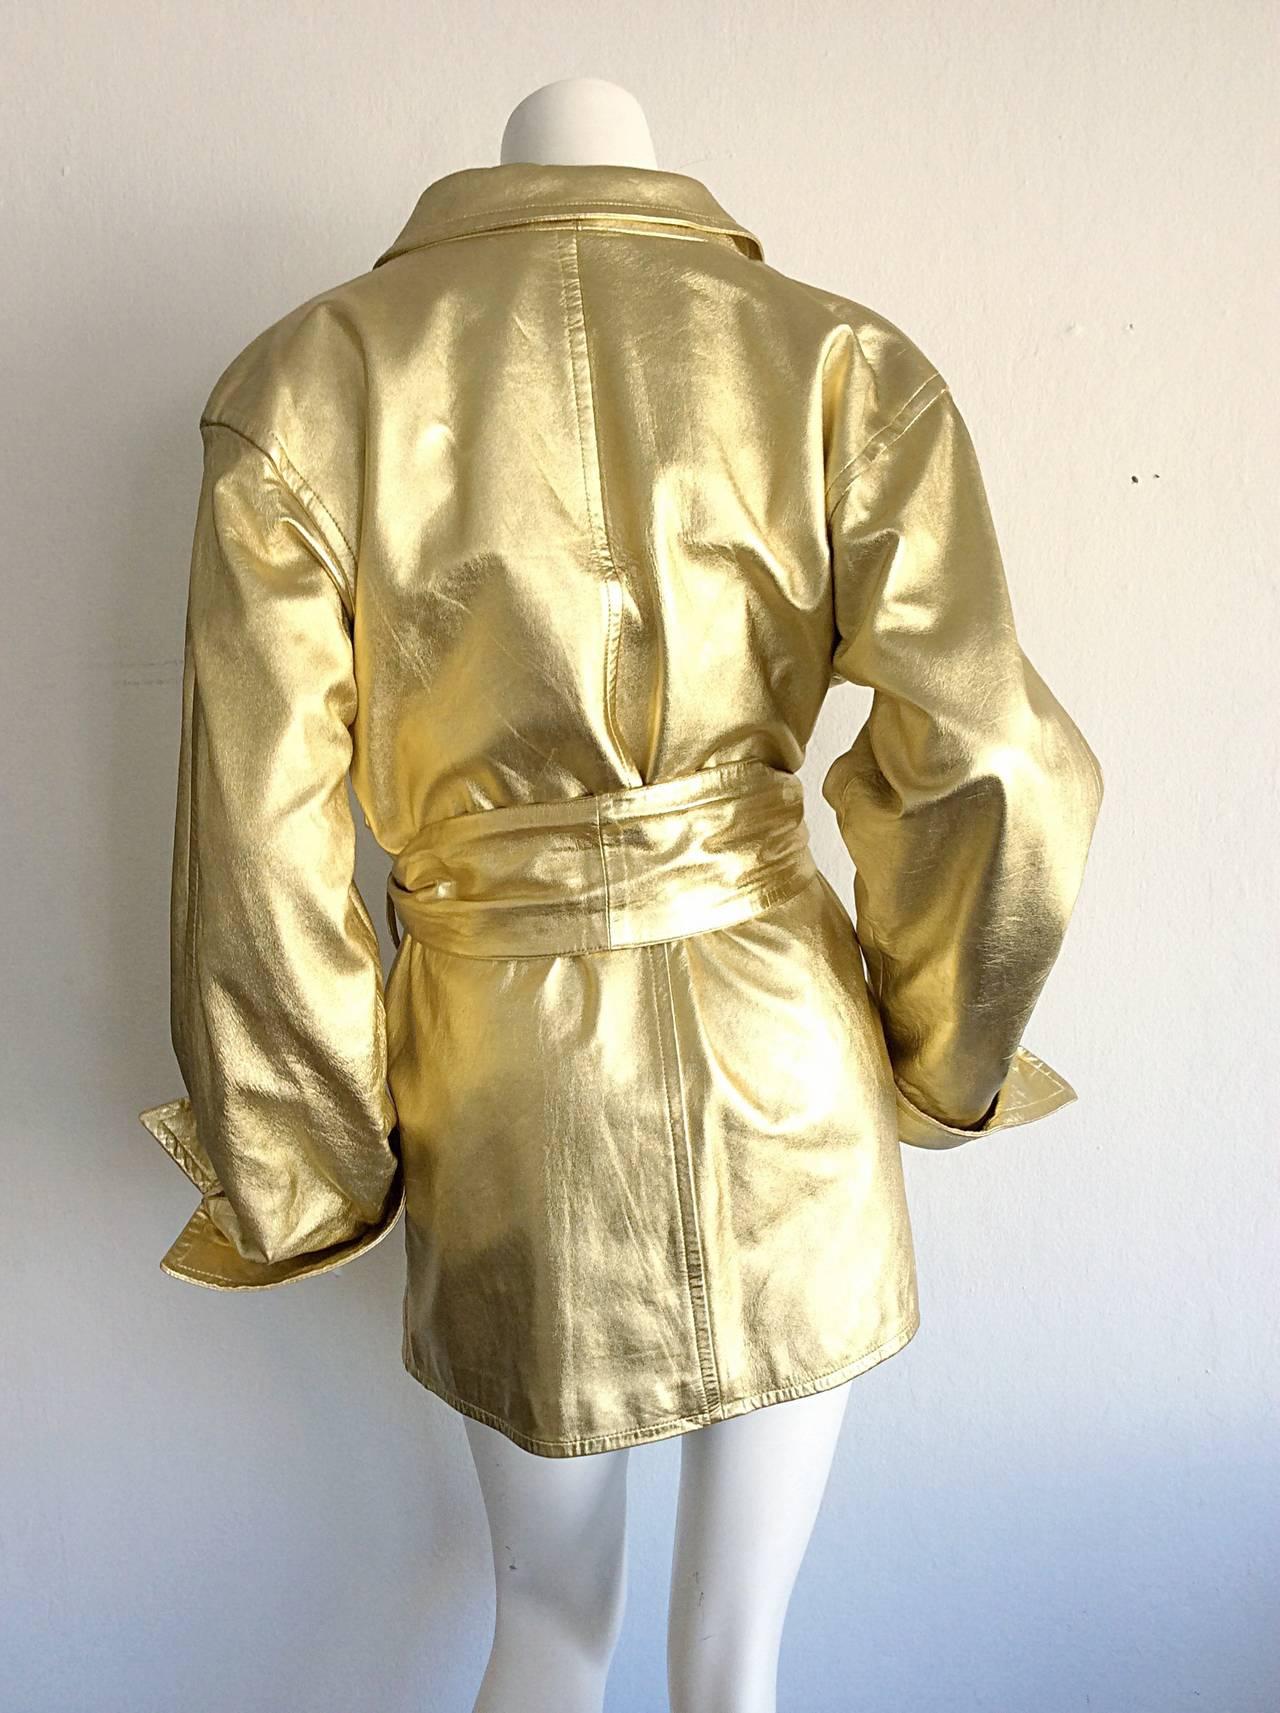 Vintage Yves Saint Laurent ' Rive Gauche ' Belted Gold Leather Jacket 5